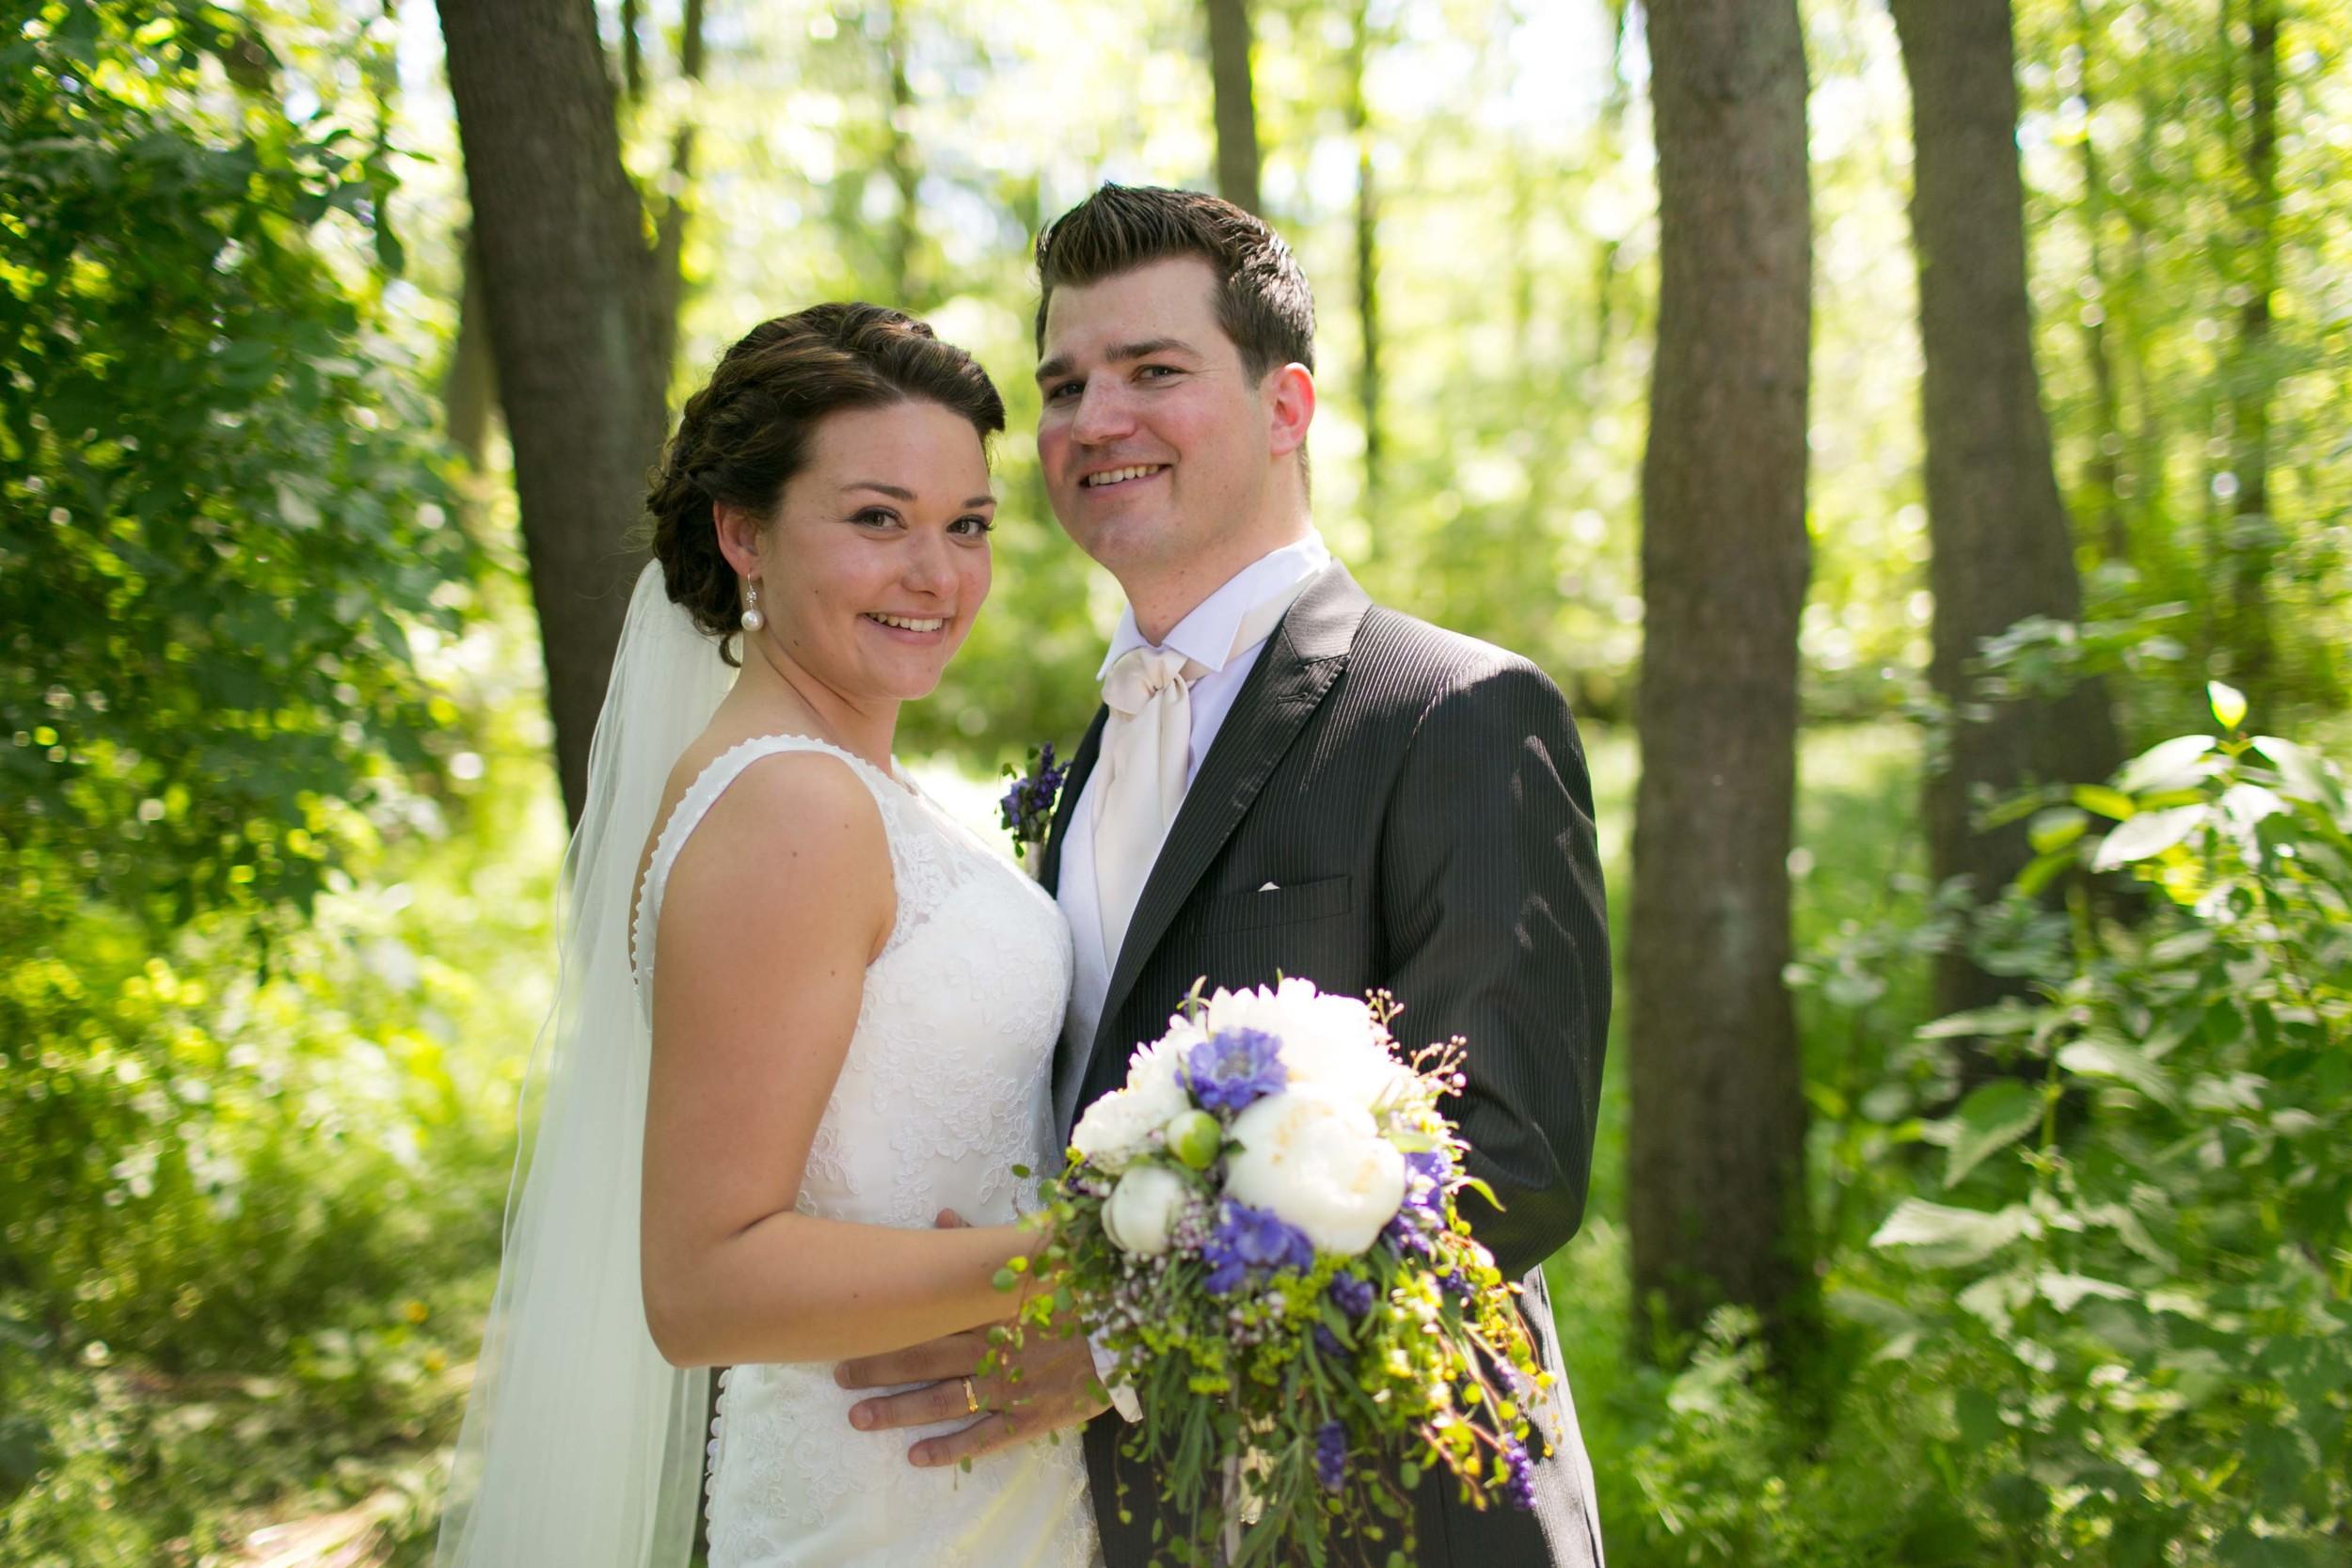 Hochzeitsfotografie Berlin_Fran Burrows Fotografie-192.jpg